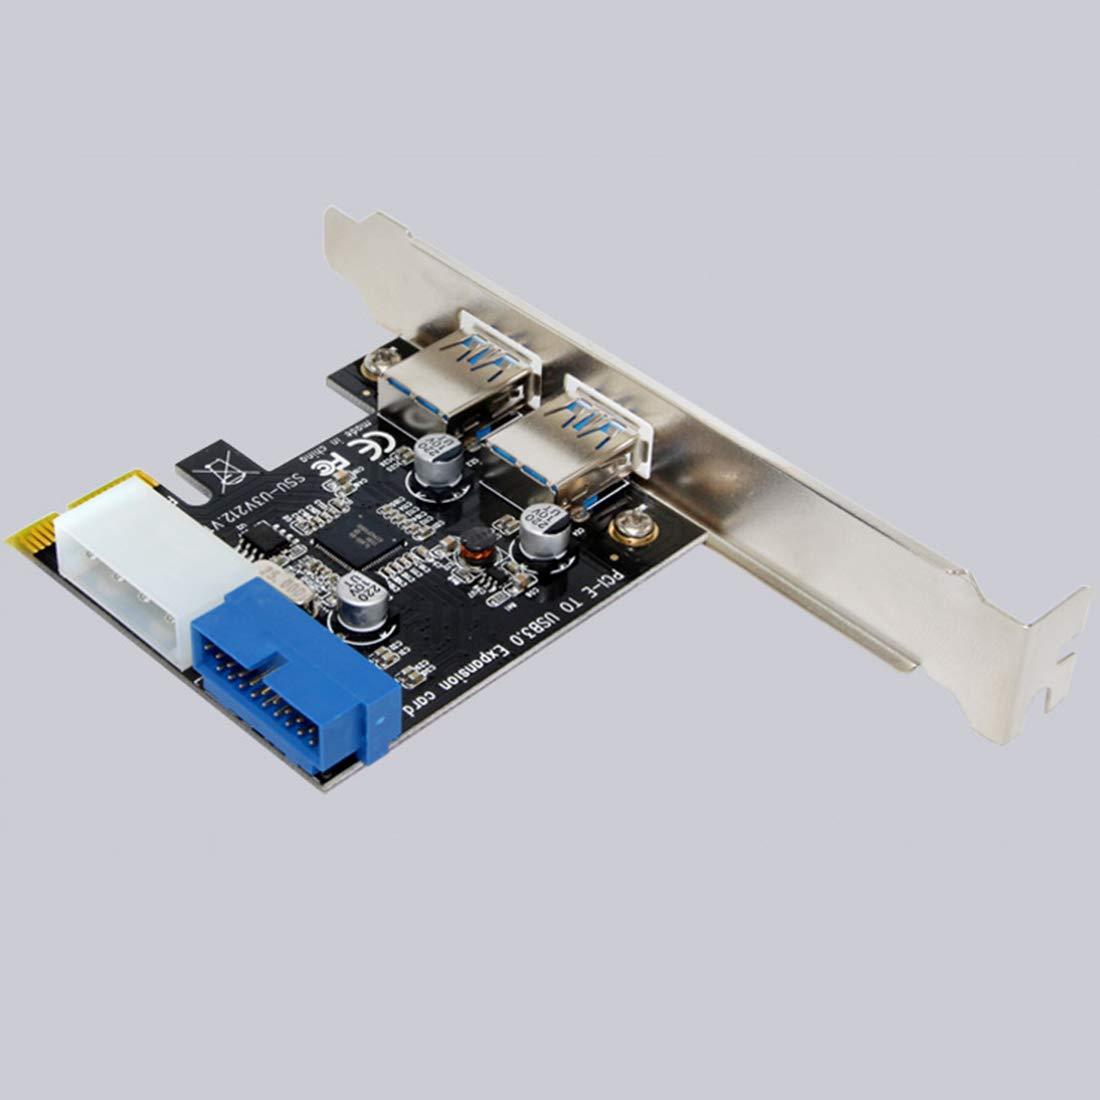 NoyoKere Tarjeta de expansi/ón PCI-E USB 3.0 Externa 2 Puertos USB3.0 Conector Interno de 19 Pines Tarjeta PCIe Conector de alimentaci/ón IDE de 4 Pines